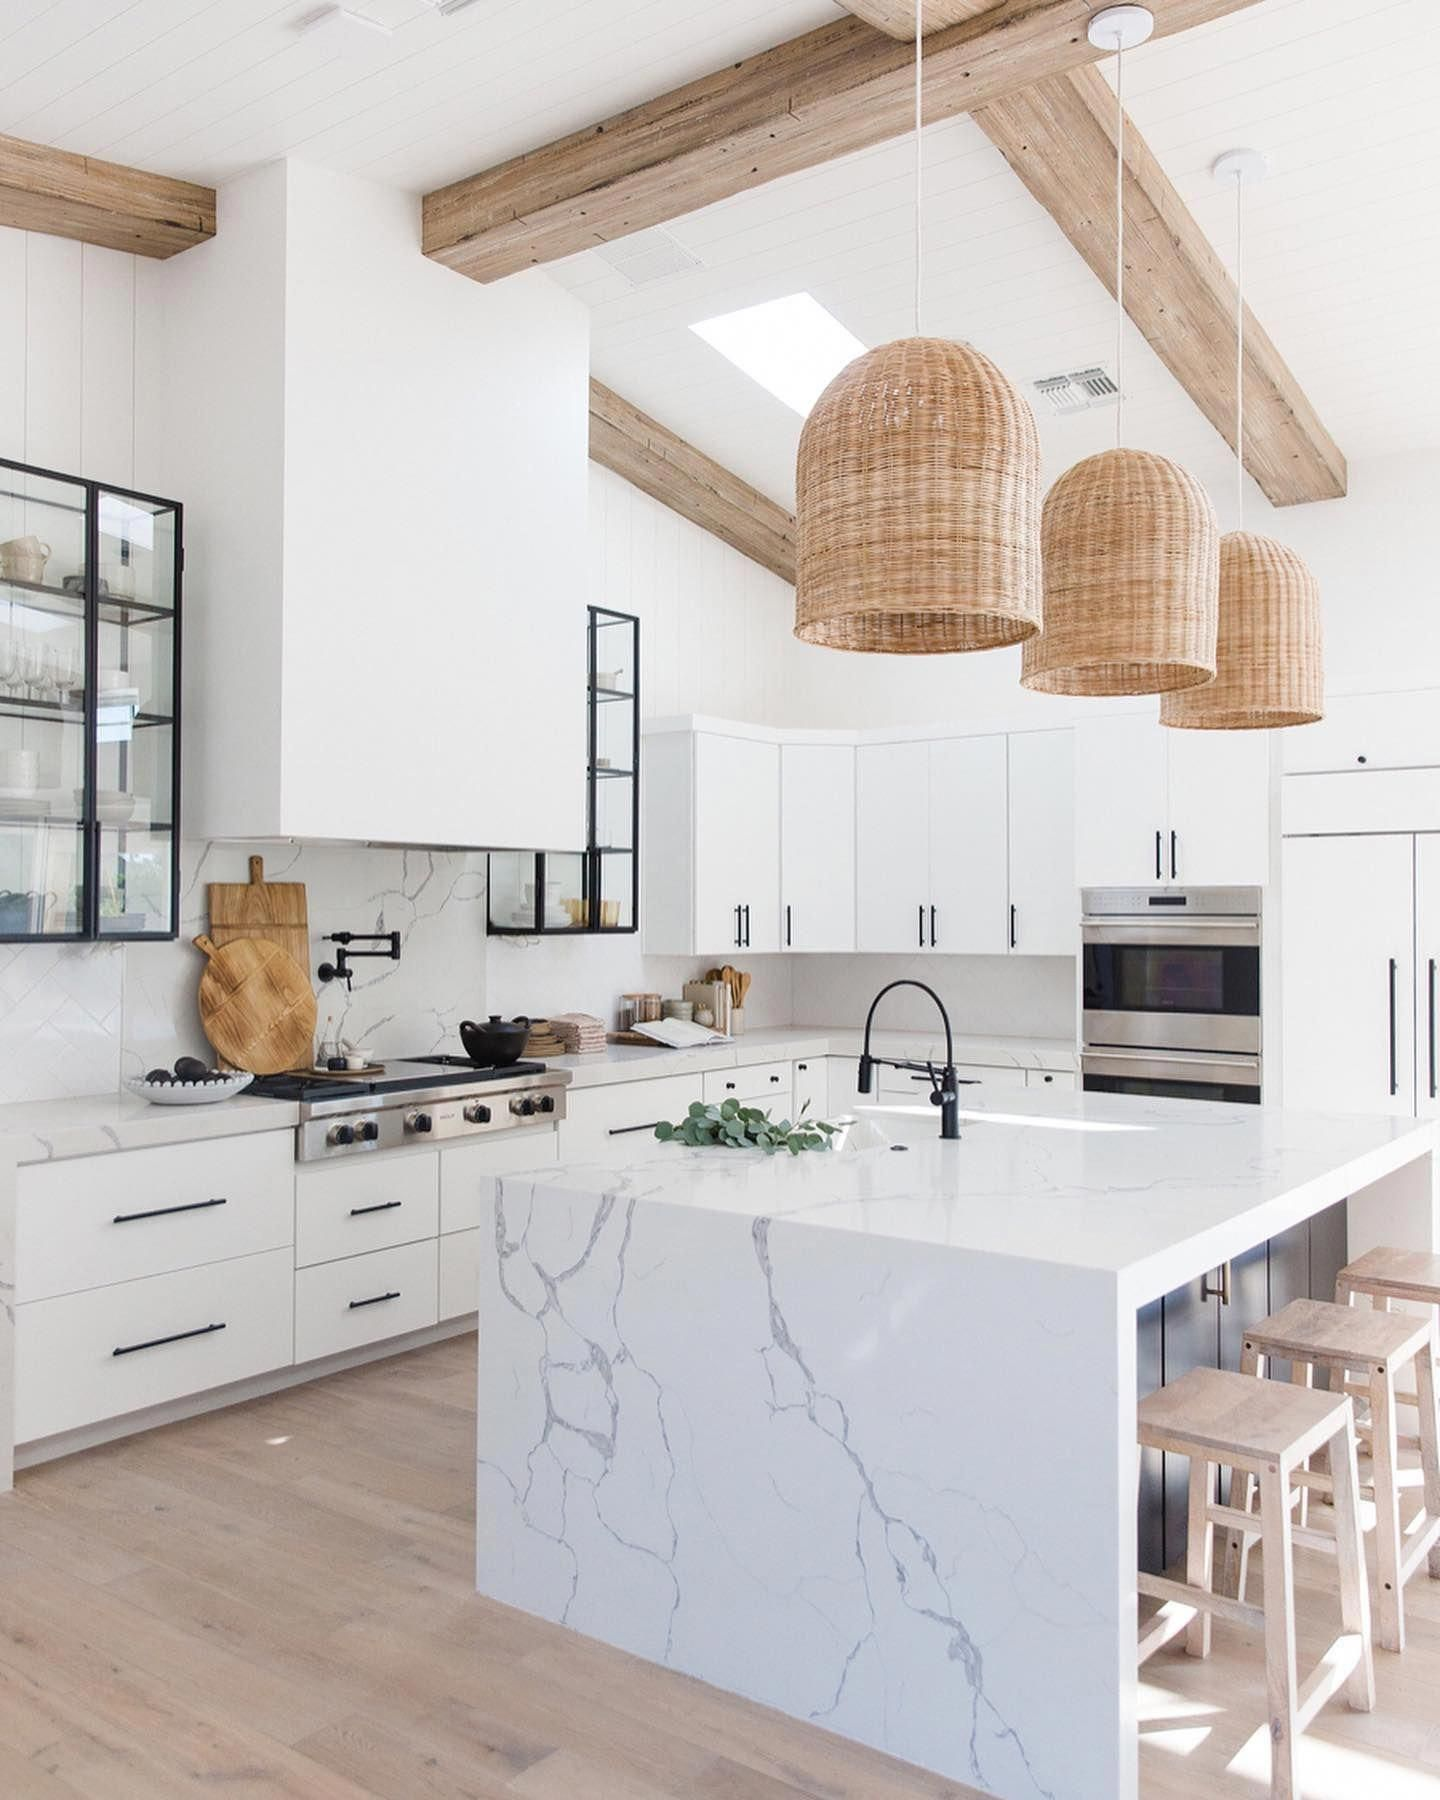 Kitchen Home Interior Design Photo Gallery   Decoomo